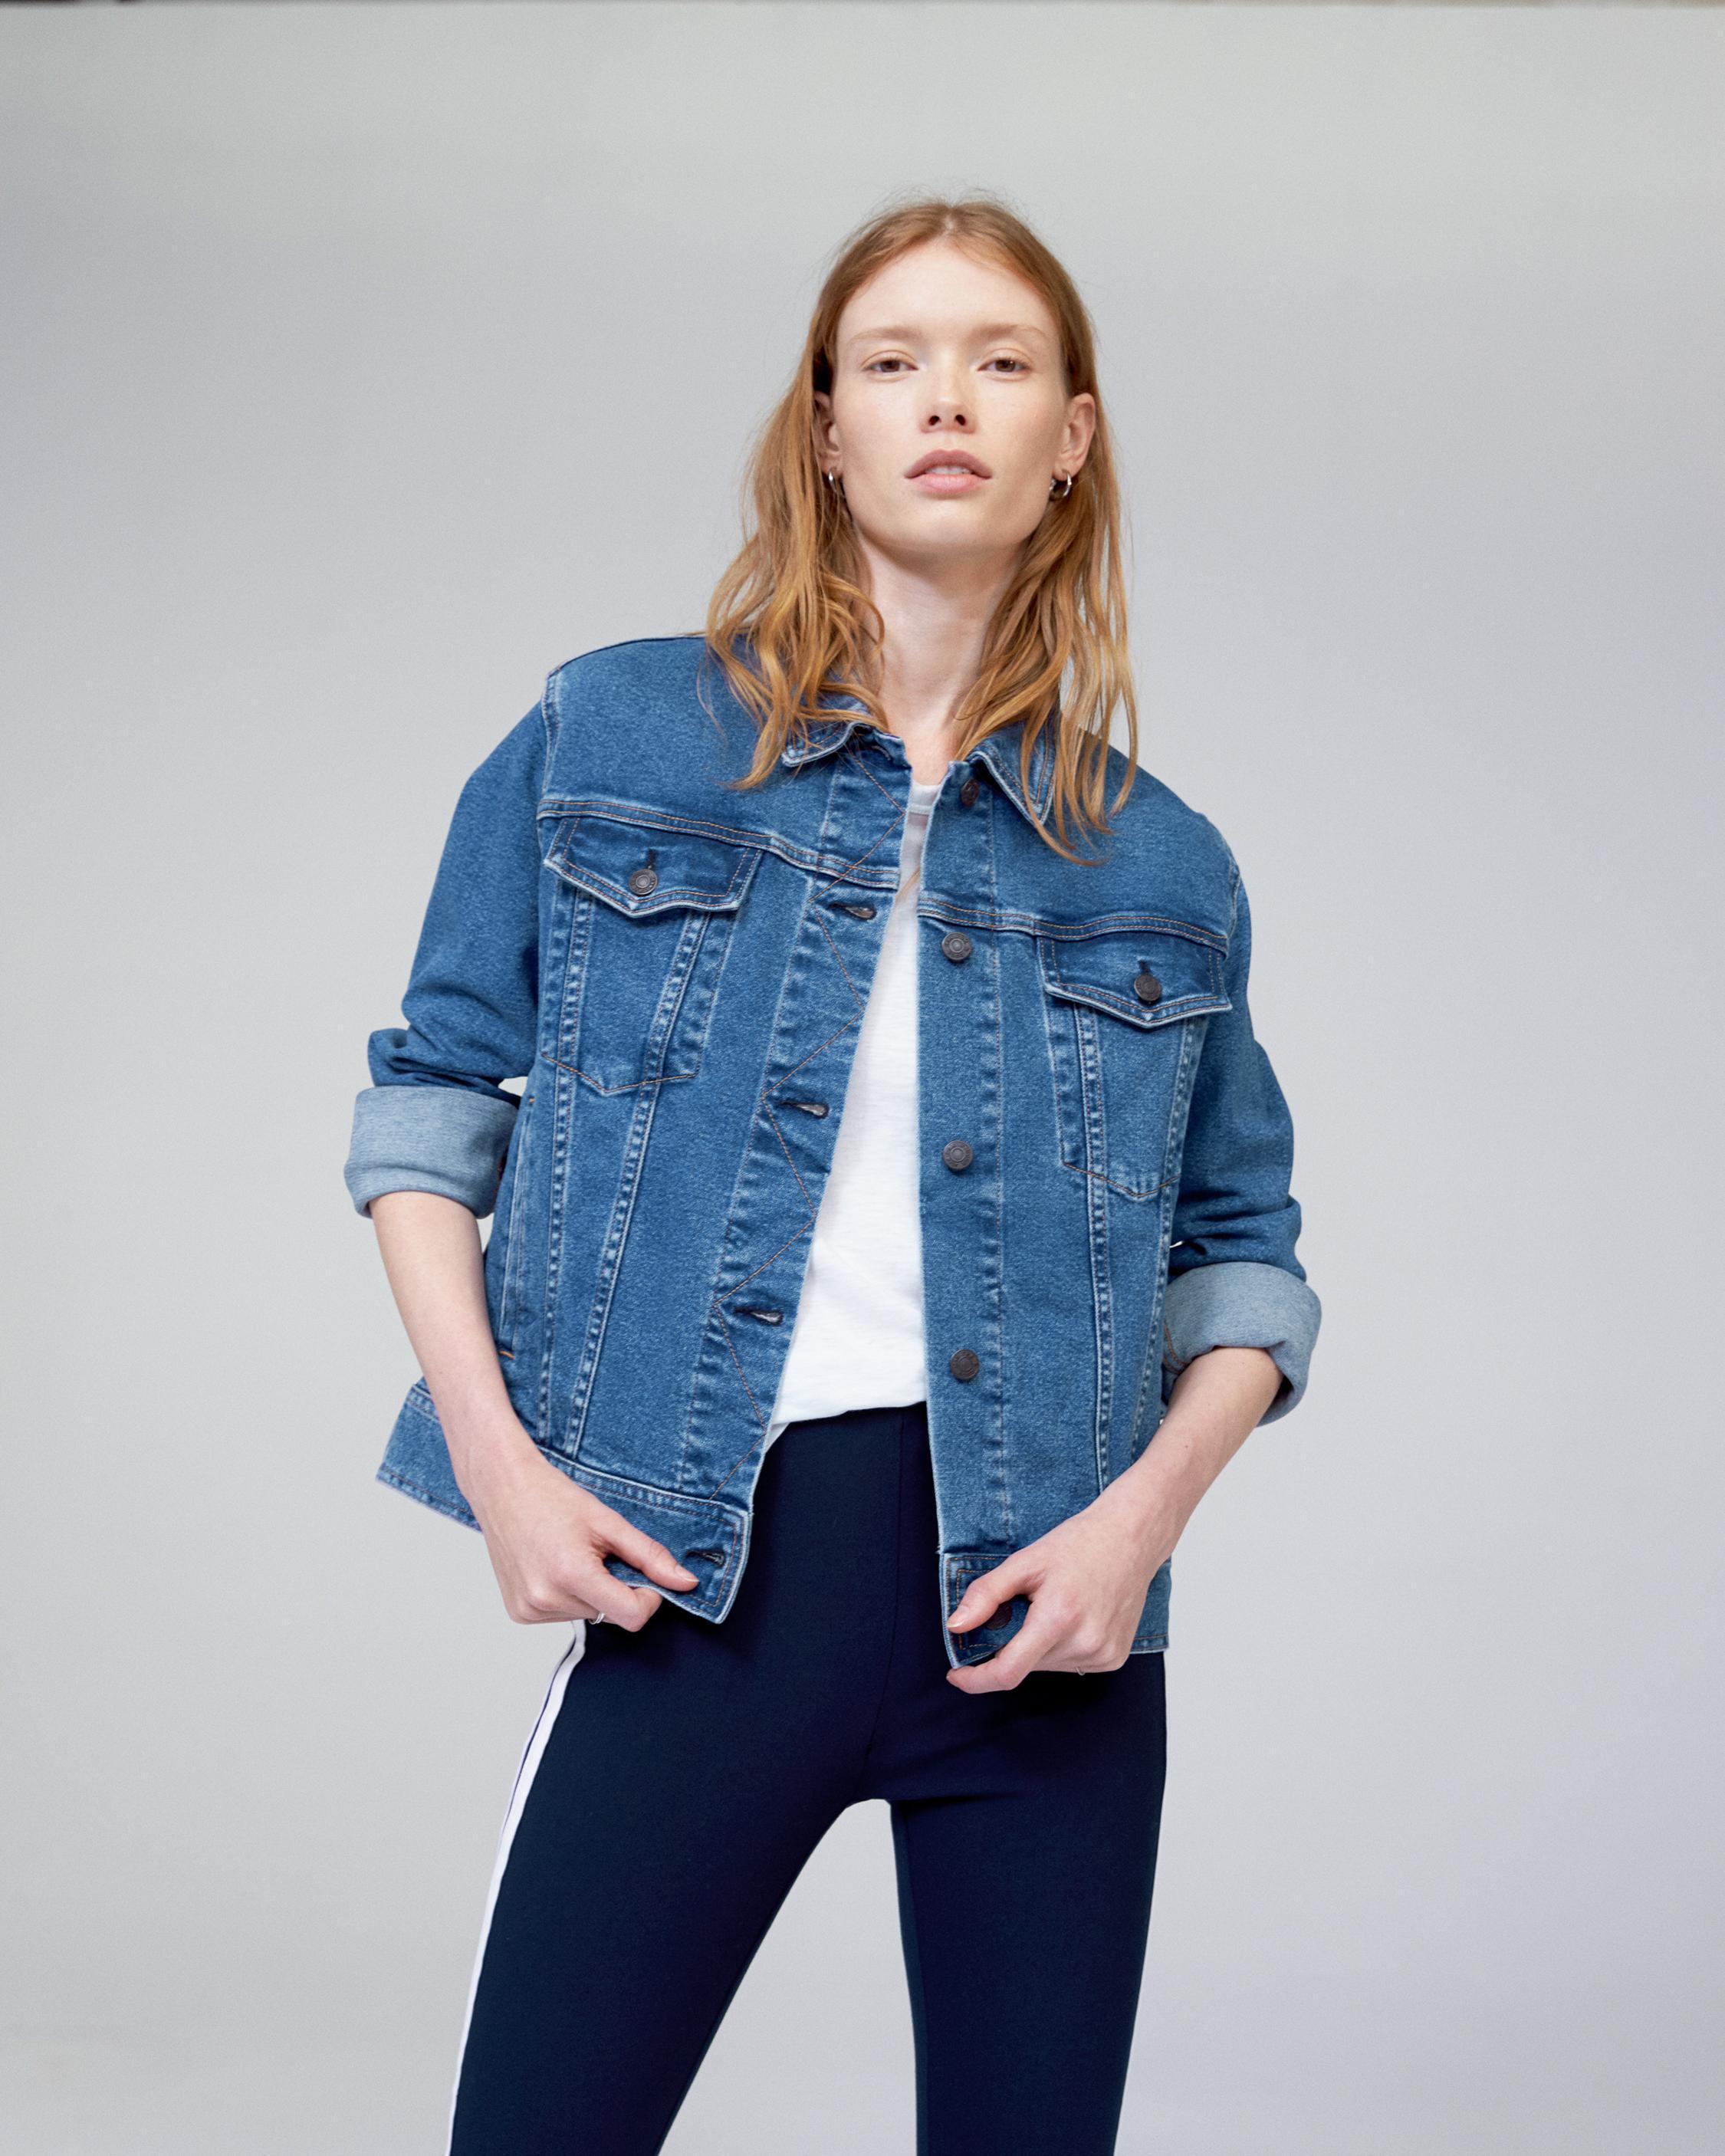 ca0ad83c3d92 Rag   Bone Oversized Jacket in Blue - Lyst